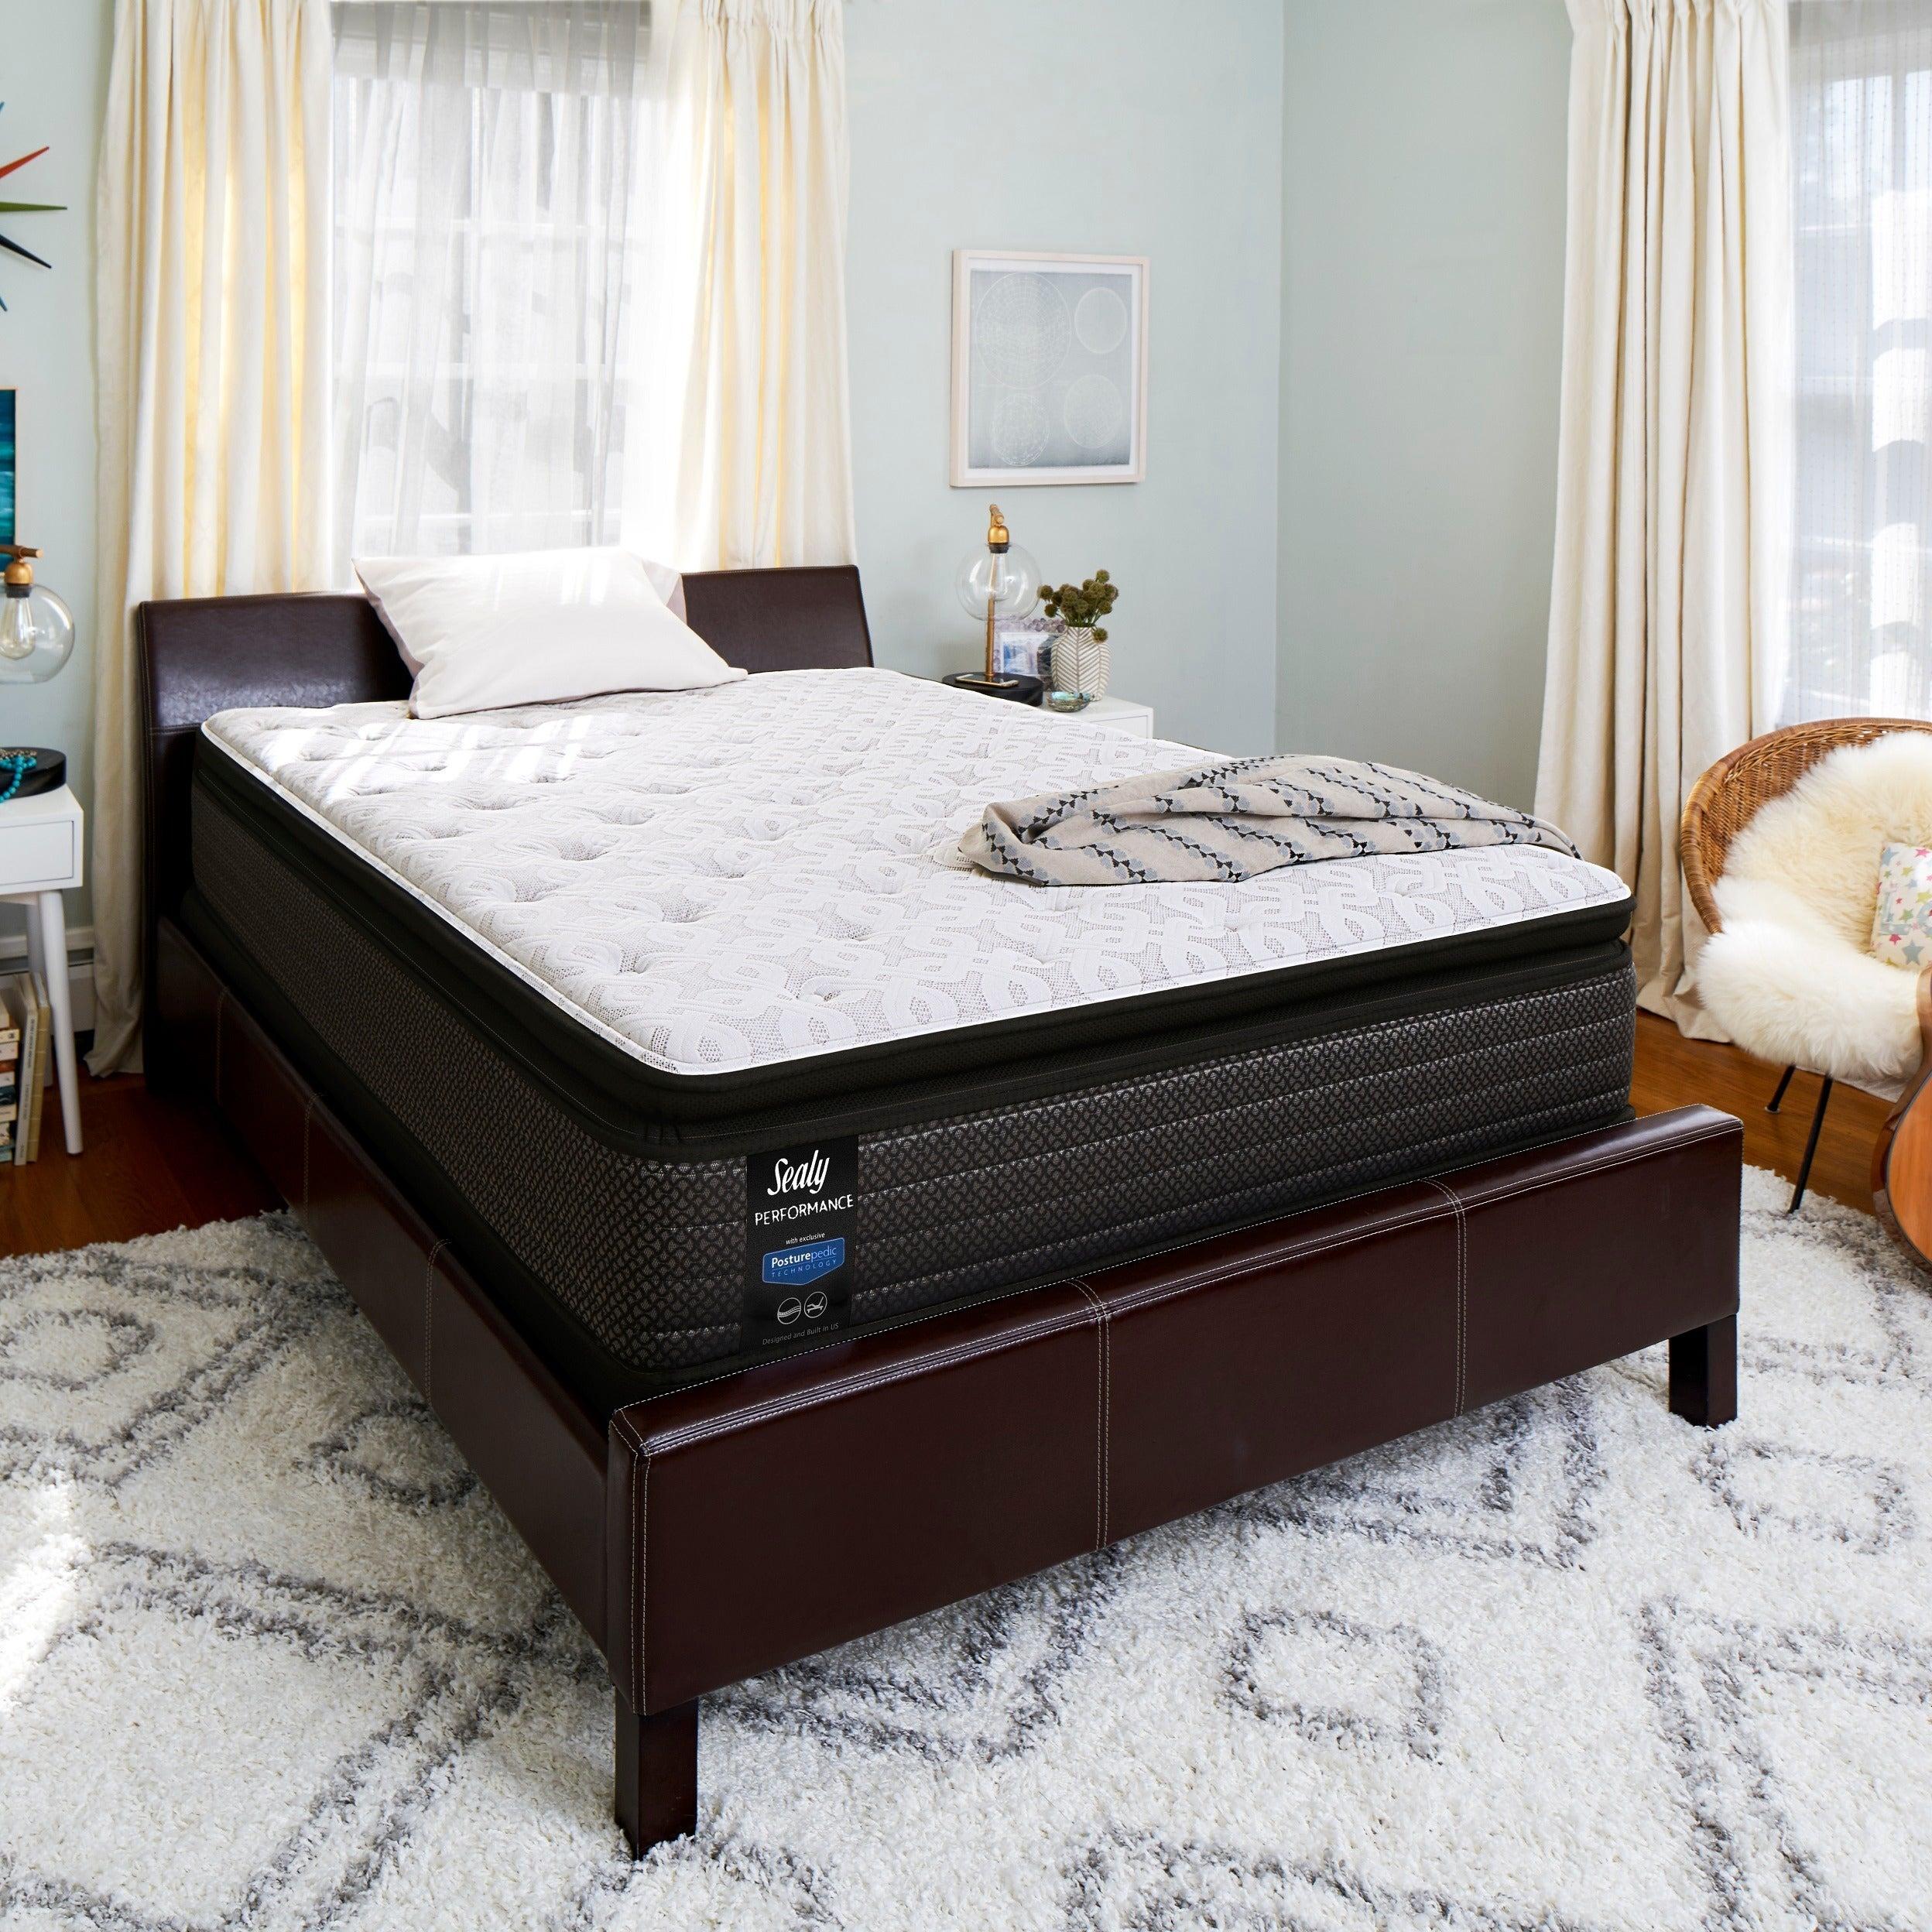 top p qlt plept mattress wid pillow euro sb plush size hei prod presnell sealy white queen sears